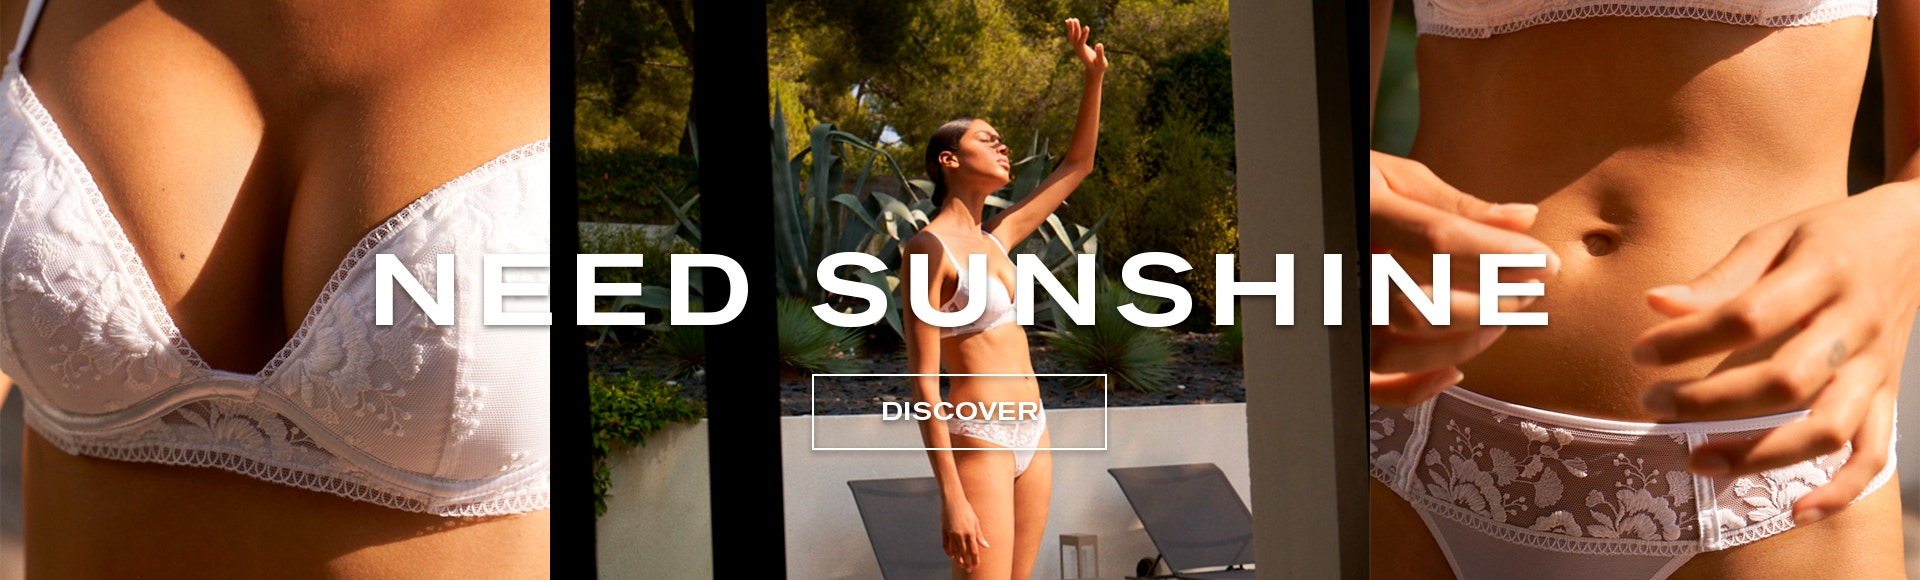 Need Sunshine